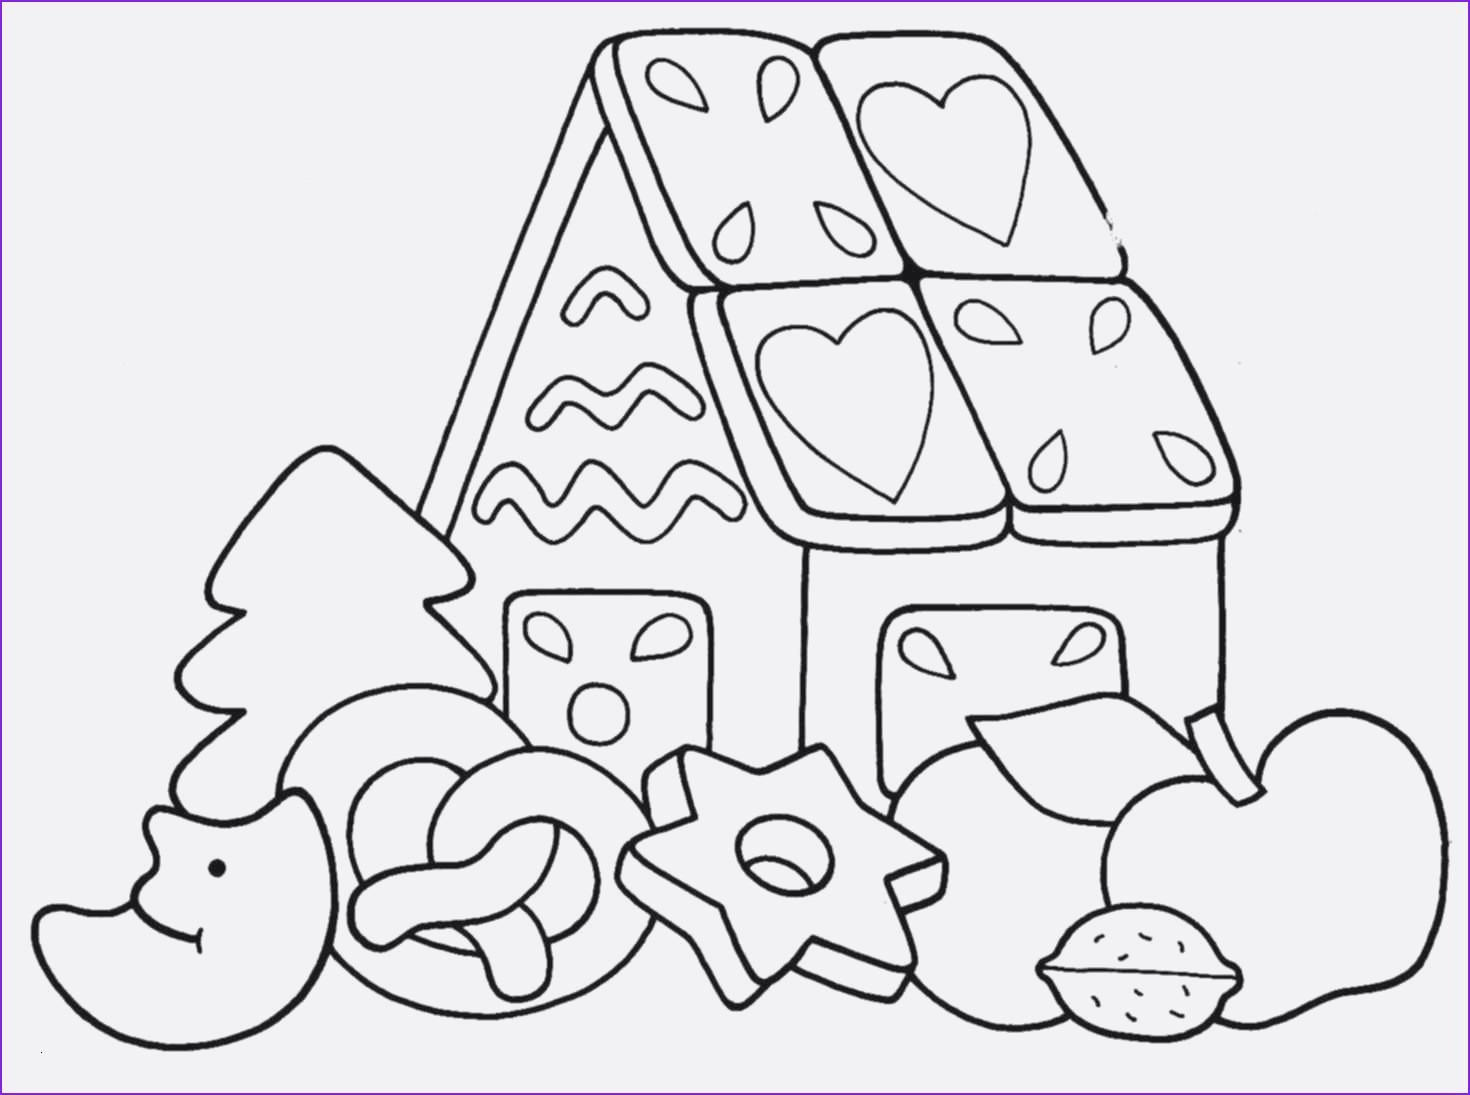 Super Mario Pilz Ausmalbilder Genial Ausmalbilder Pilze Best 10 Besten Coloring Bilder Auf Pinterest Bild